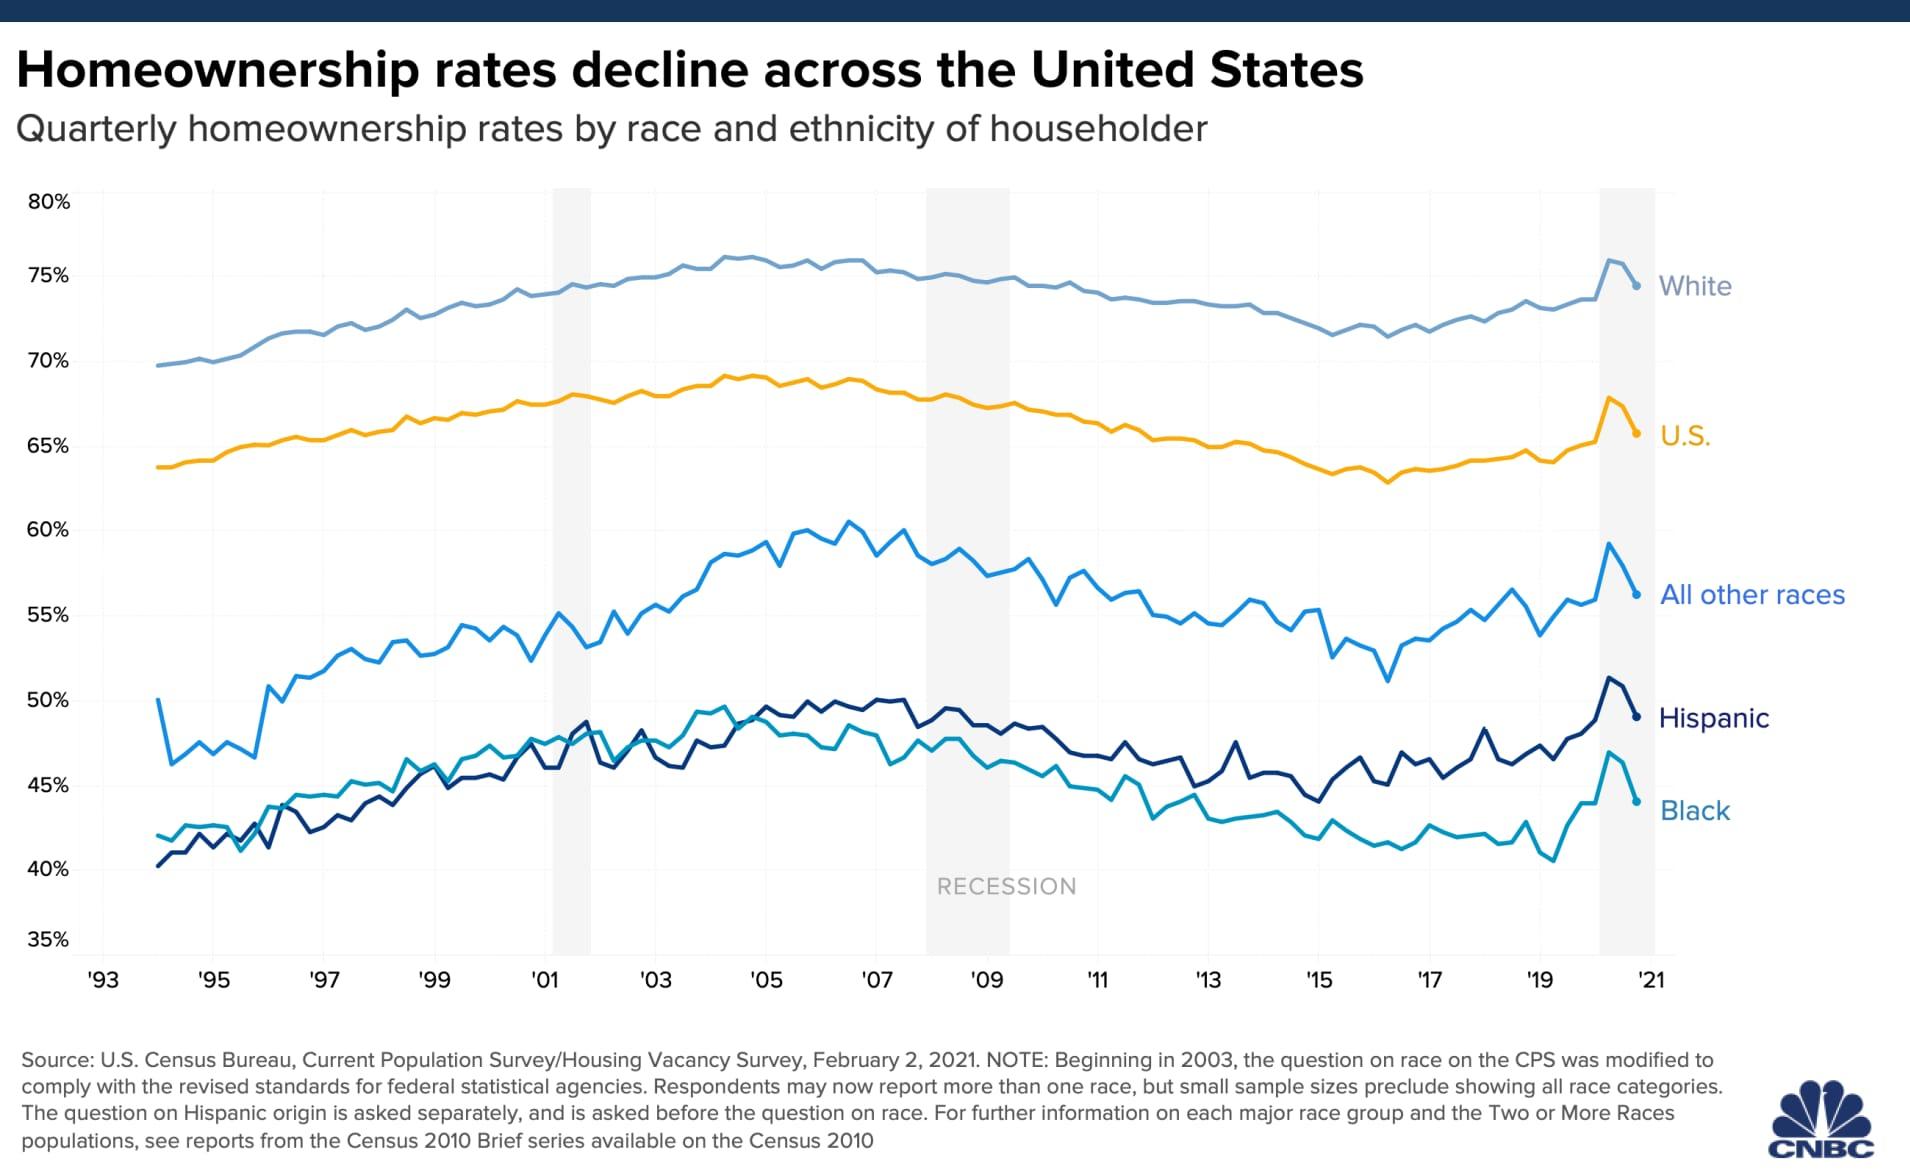 White, Hispanic, Black Homeownership Rate 2021 back to 1993 - The Bais Point